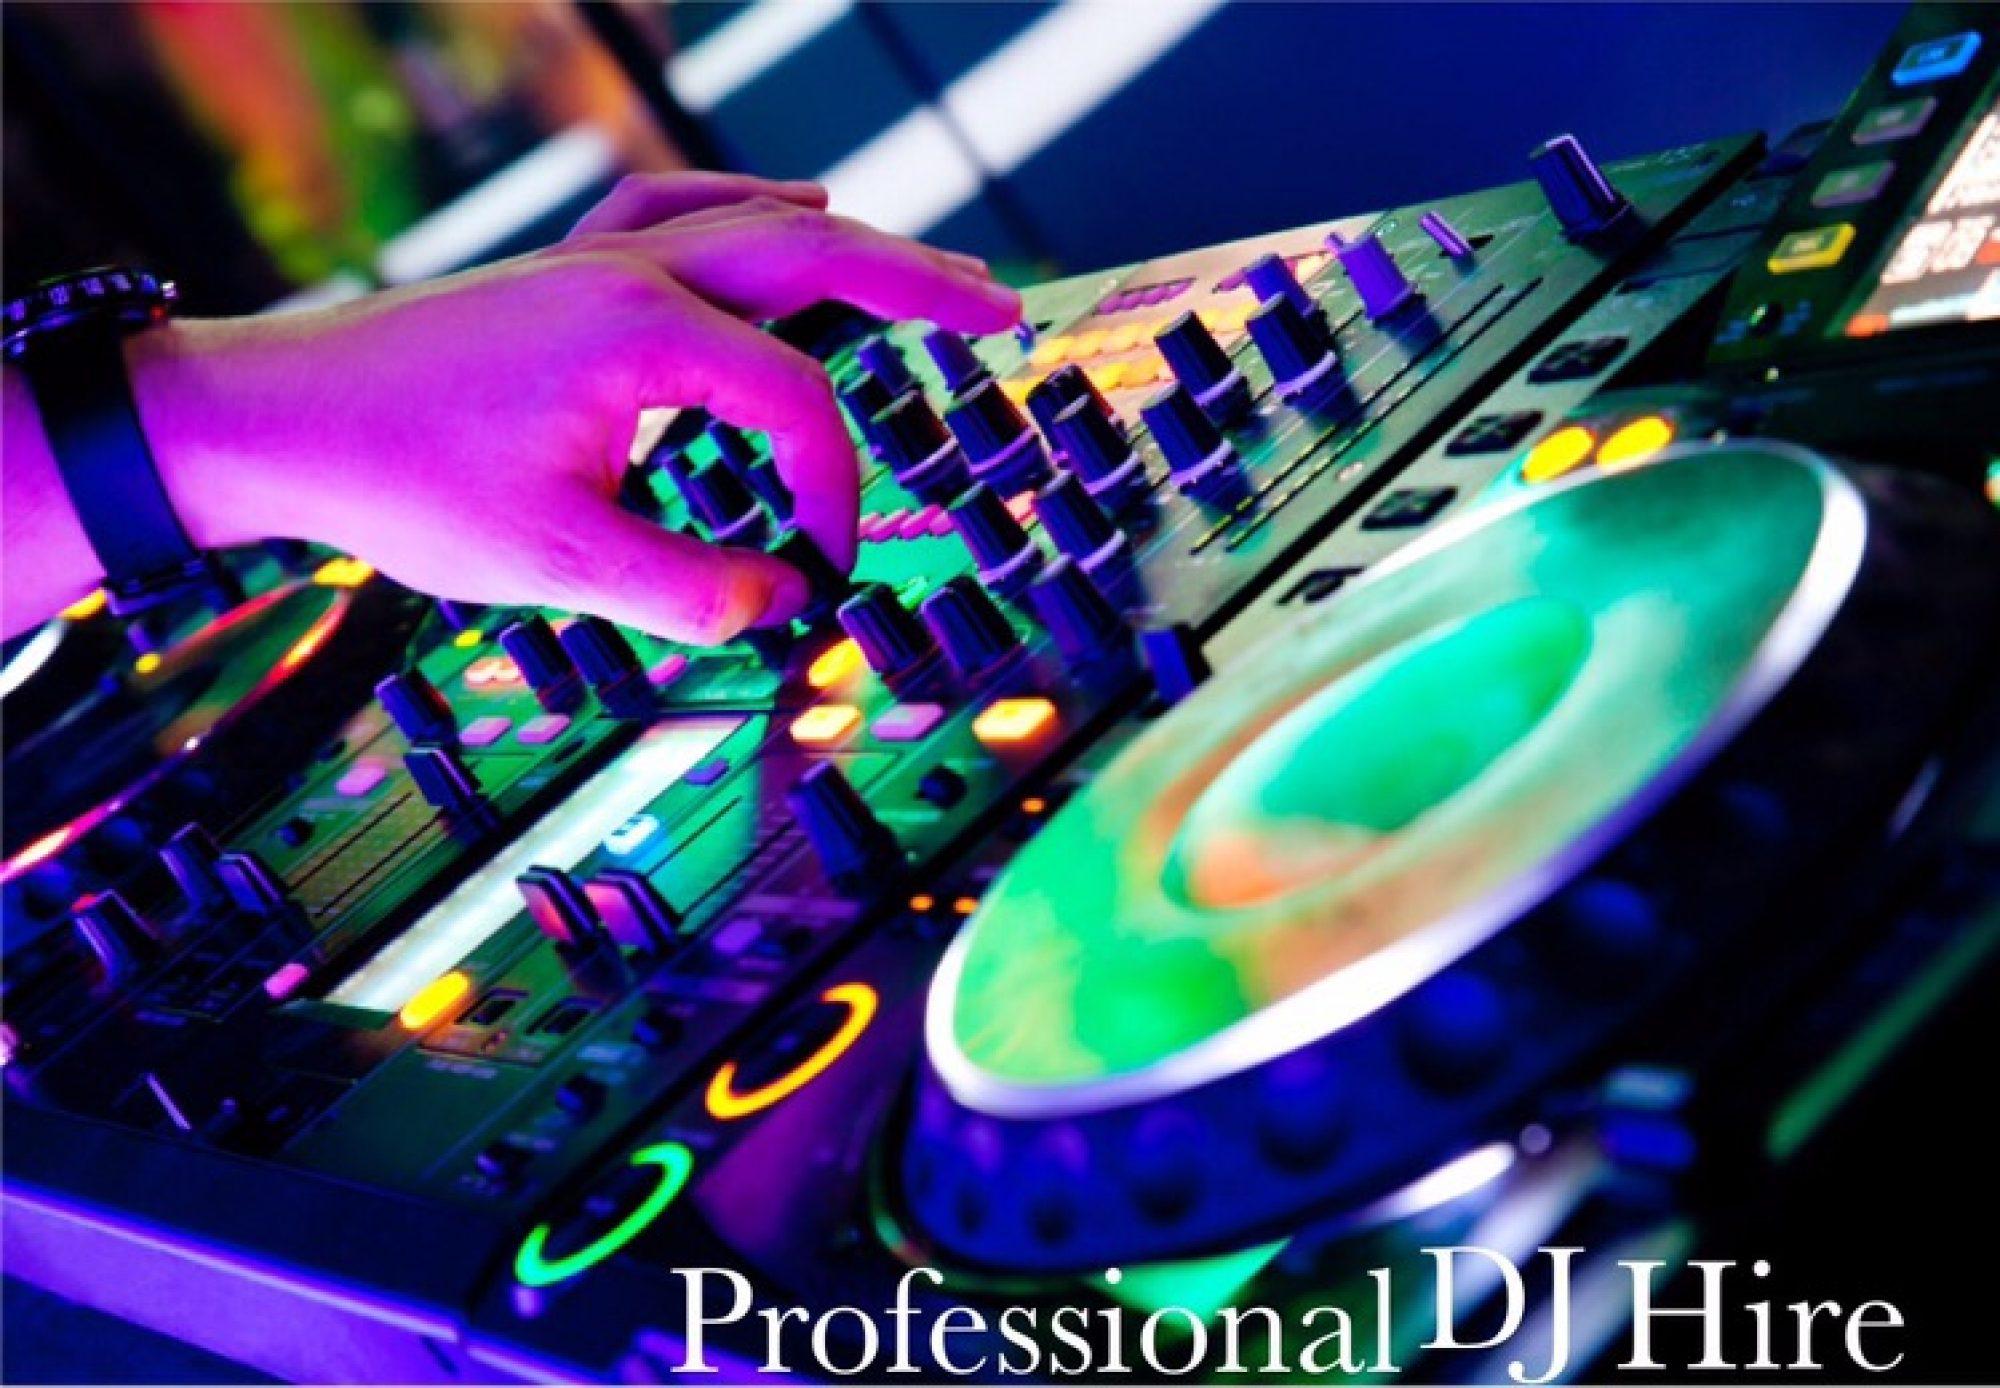 DJS4DUBLIN